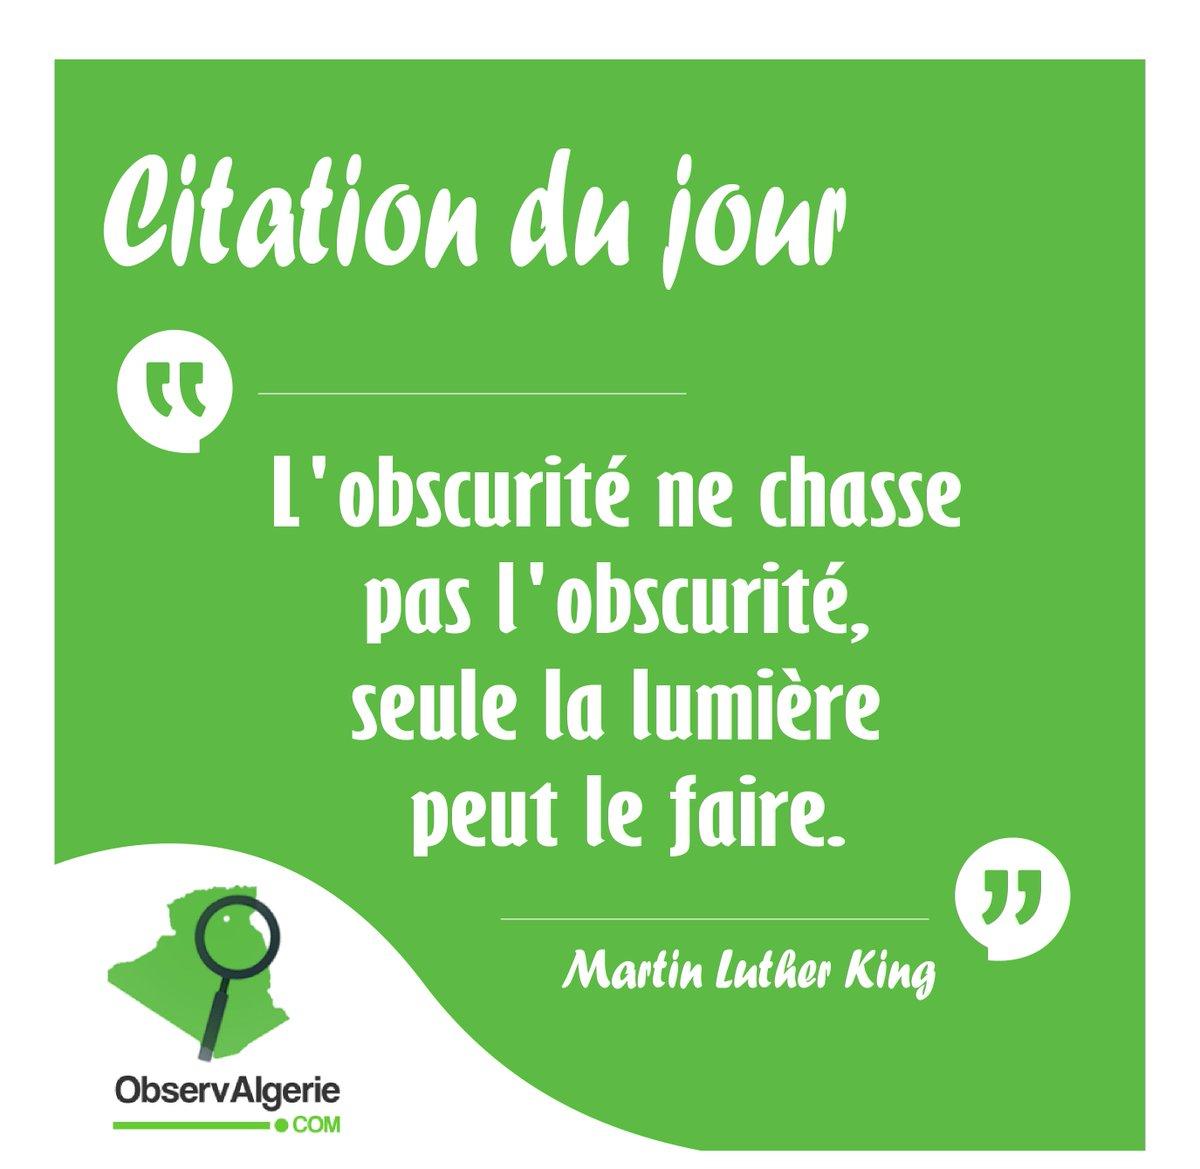 Observalgérie On Twitter Citation Du Jour Bonjour